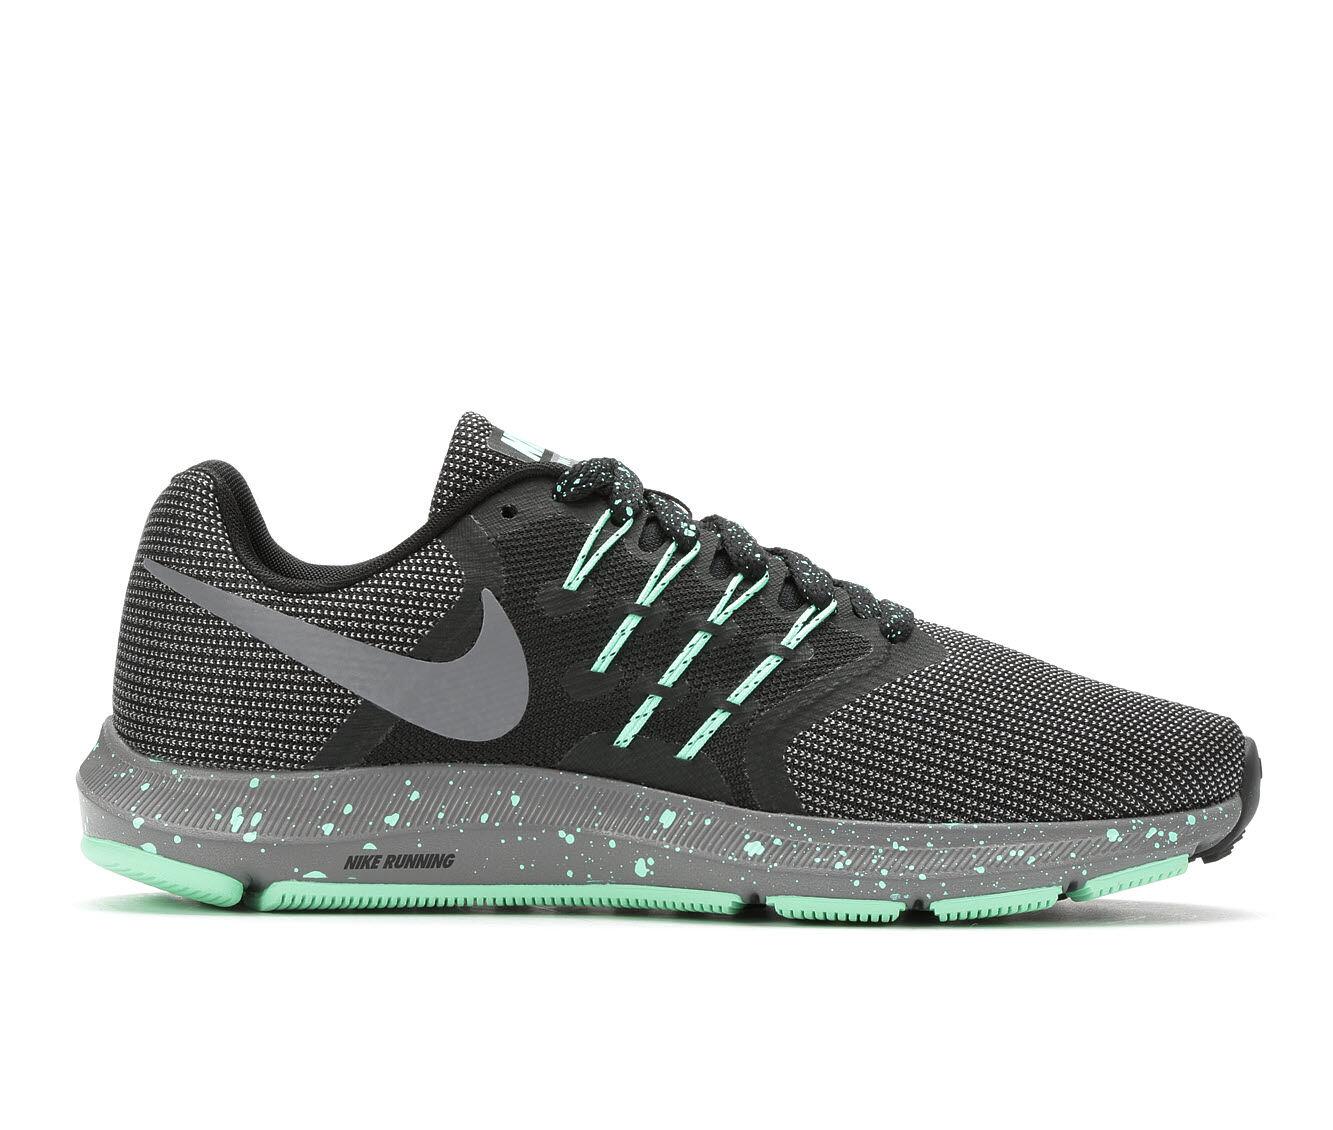 choose authentic cheap Women's Nike Run Swift SE Running Shoes Blk/Gry/Green